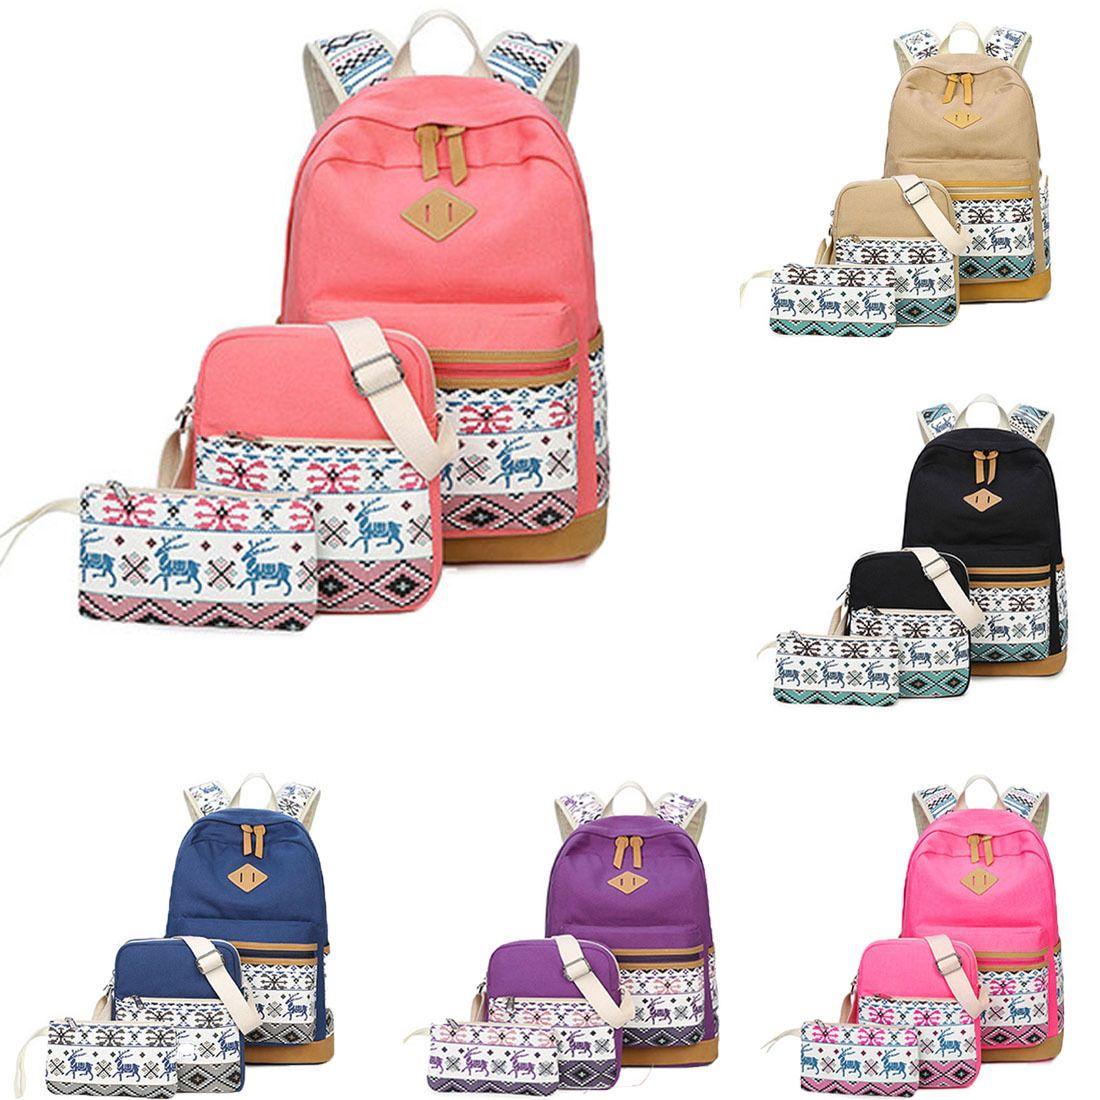 7de3cba36c9b 3Pcs Set Backpack Women Canvas Travel Bookbags School Bags For Teenage Girls